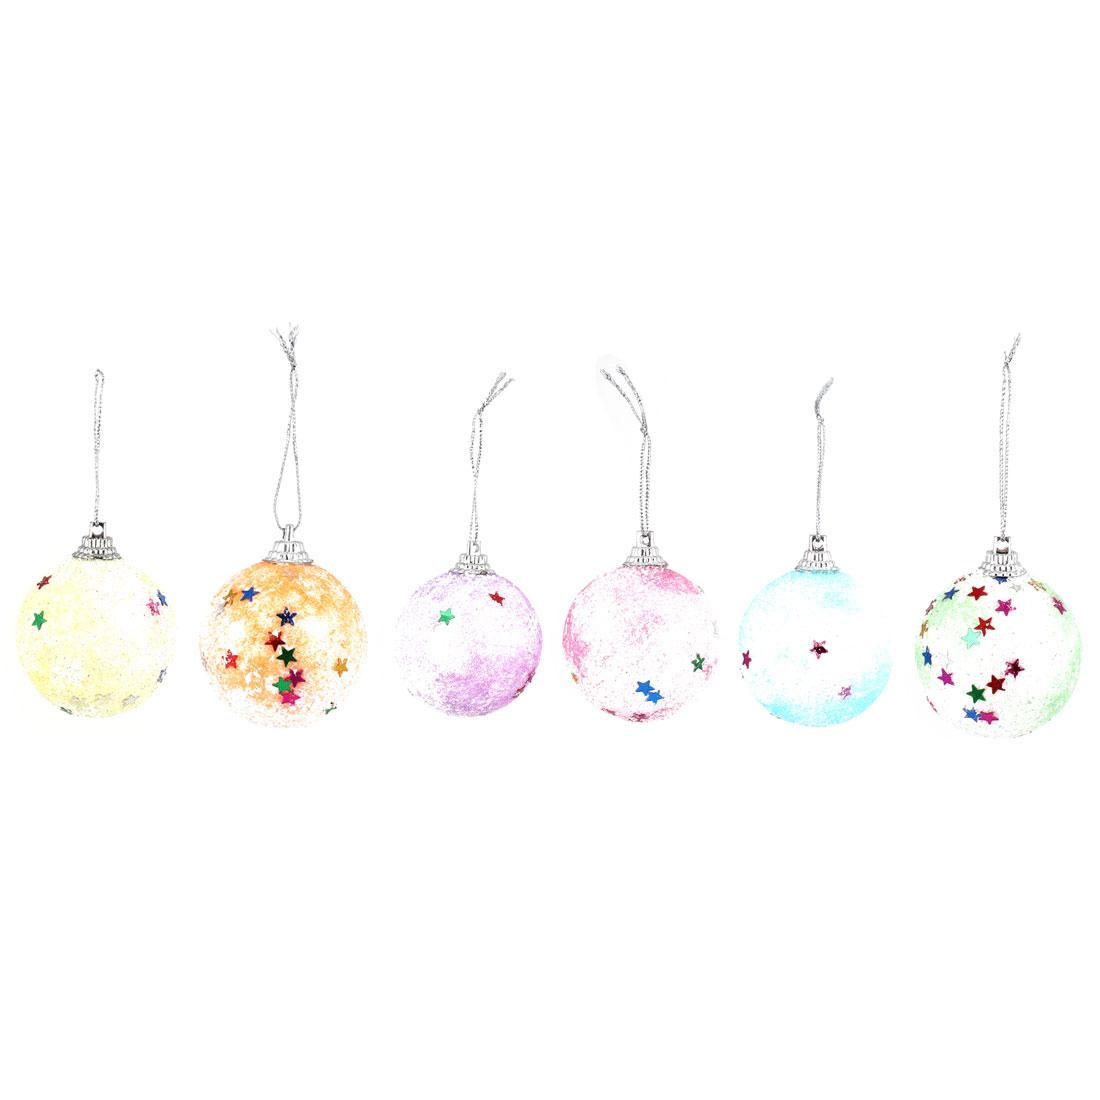 Pentagram Accent Christmas Colorful Balls Pendant 6pcs for Xmas Tree Dangling Decor